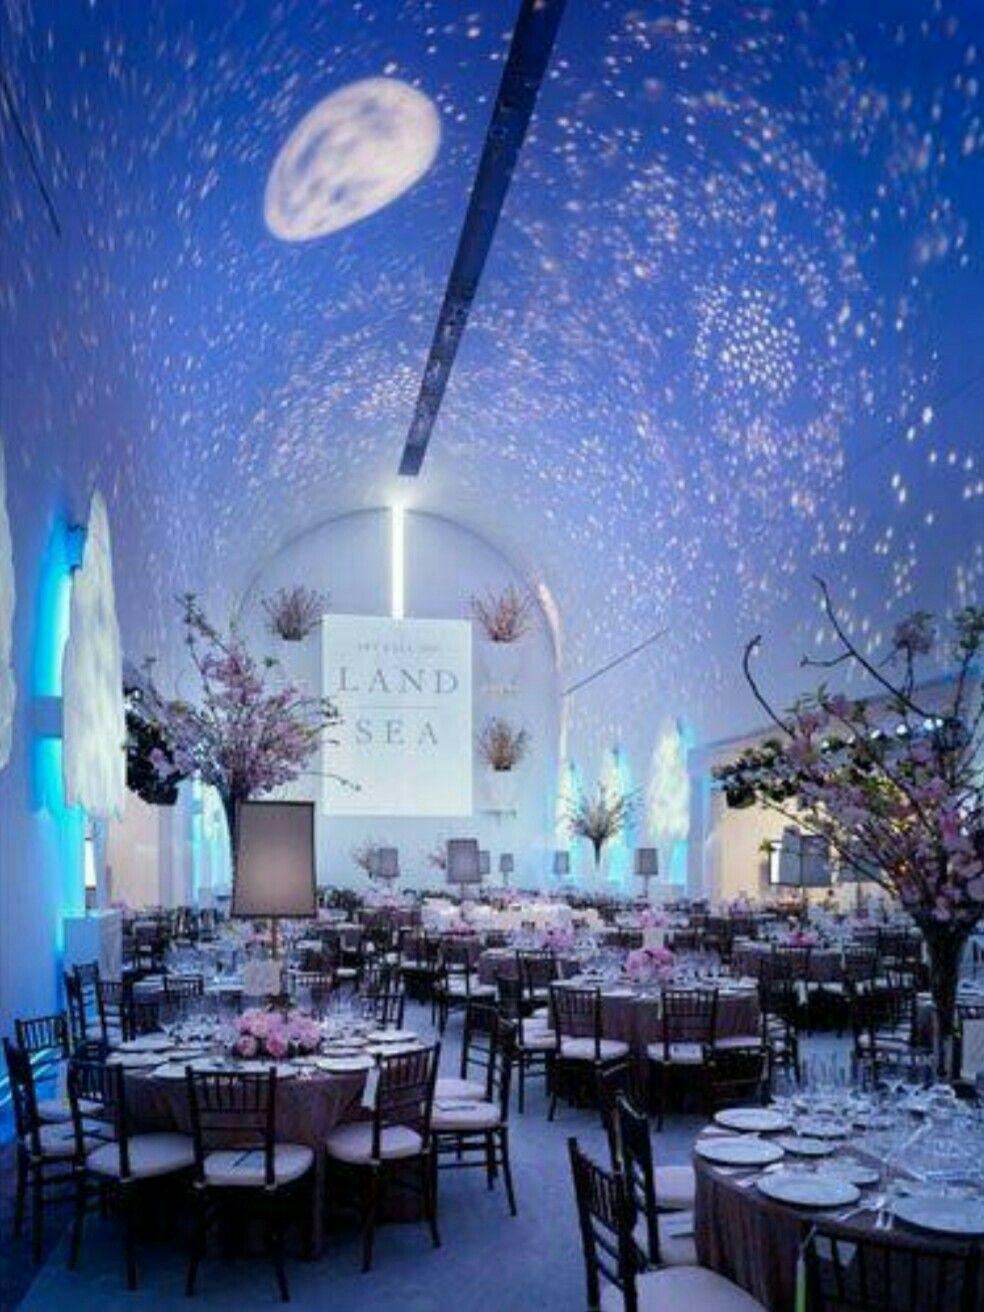 Night wedding decor ideas  Beautiful Starry Night  Wedding Ideas  Pinterest  Wedding